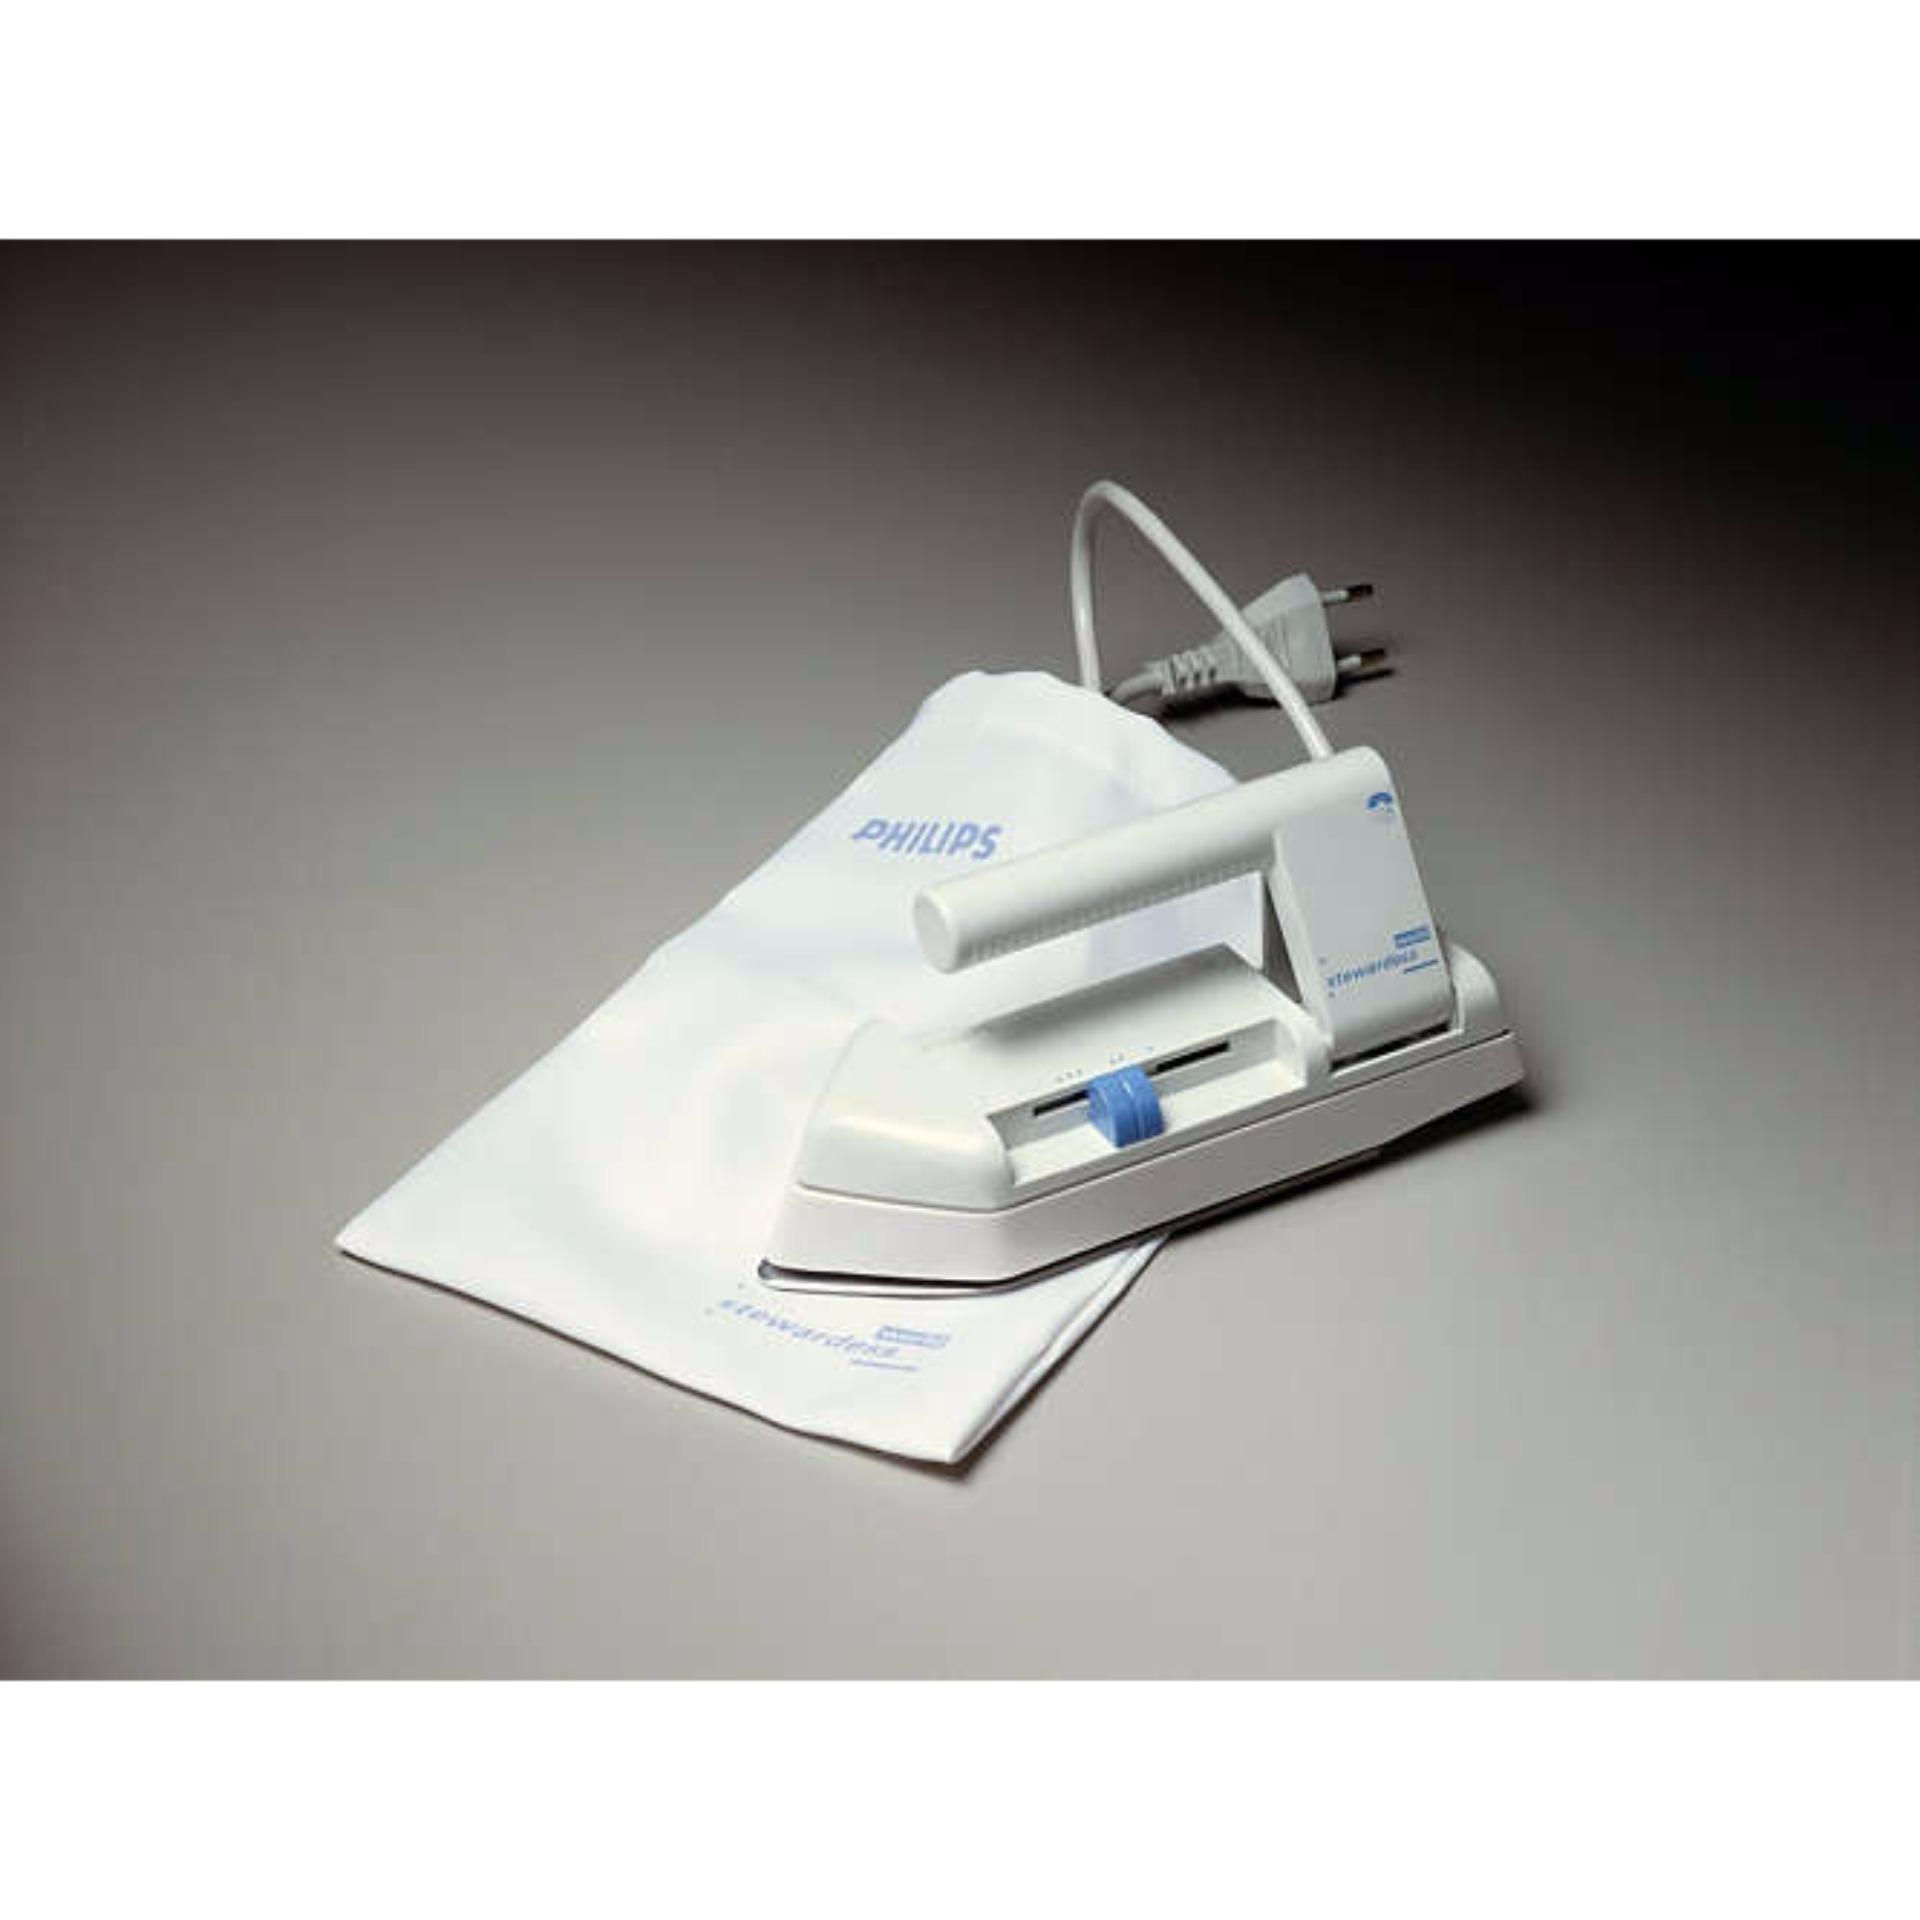 Terbaik Murah Philips Seterika Portable Travel Iron Hd 1301 02 Setrika 1172 Hitam Putih